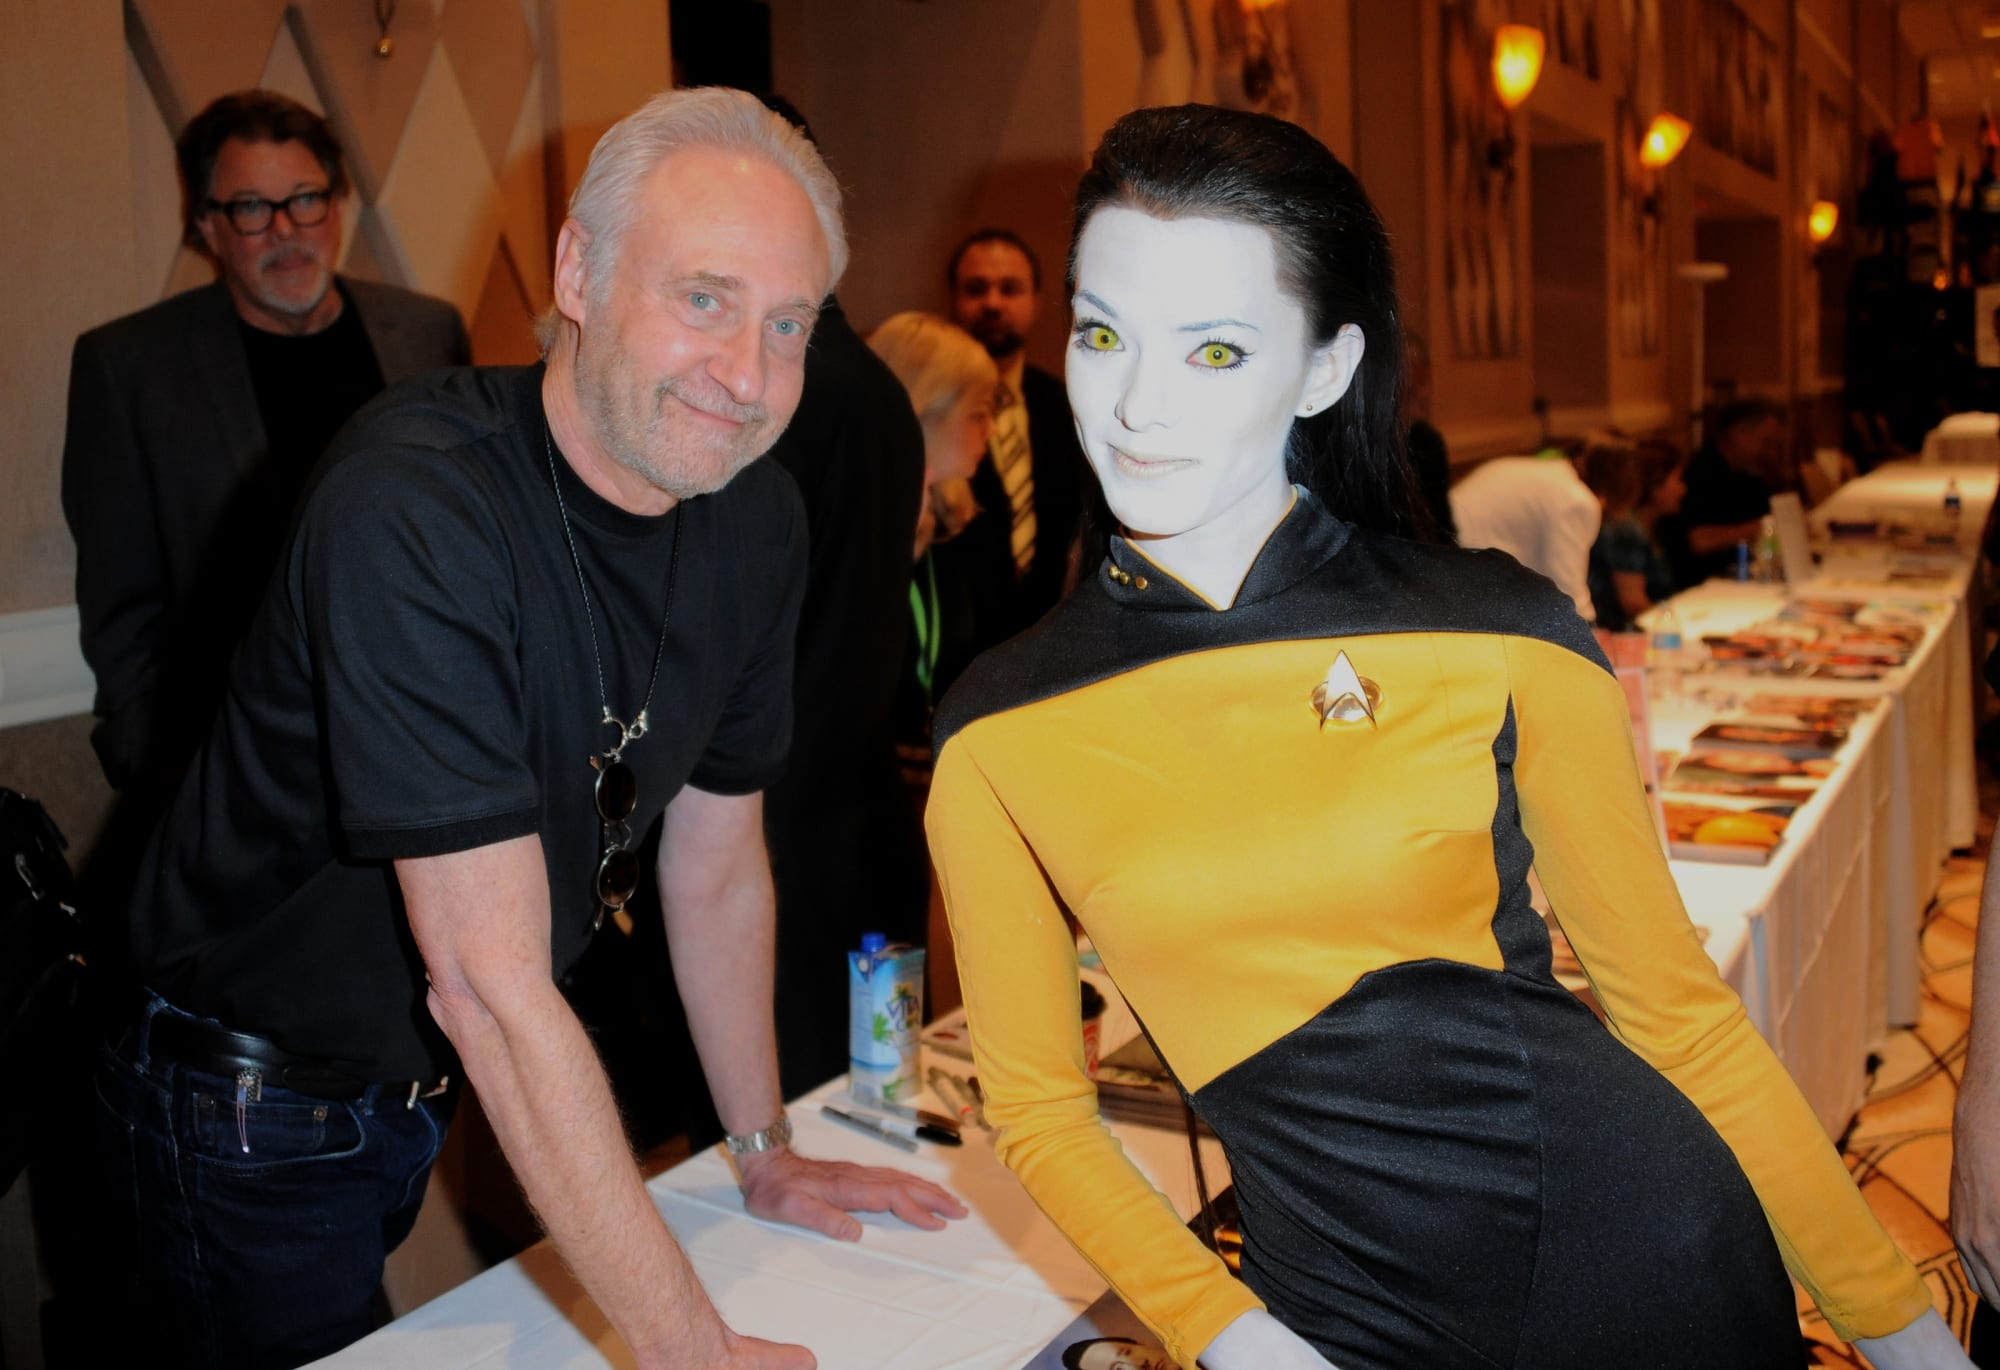 Star Trek The Next Generation: Data was going to save JFK